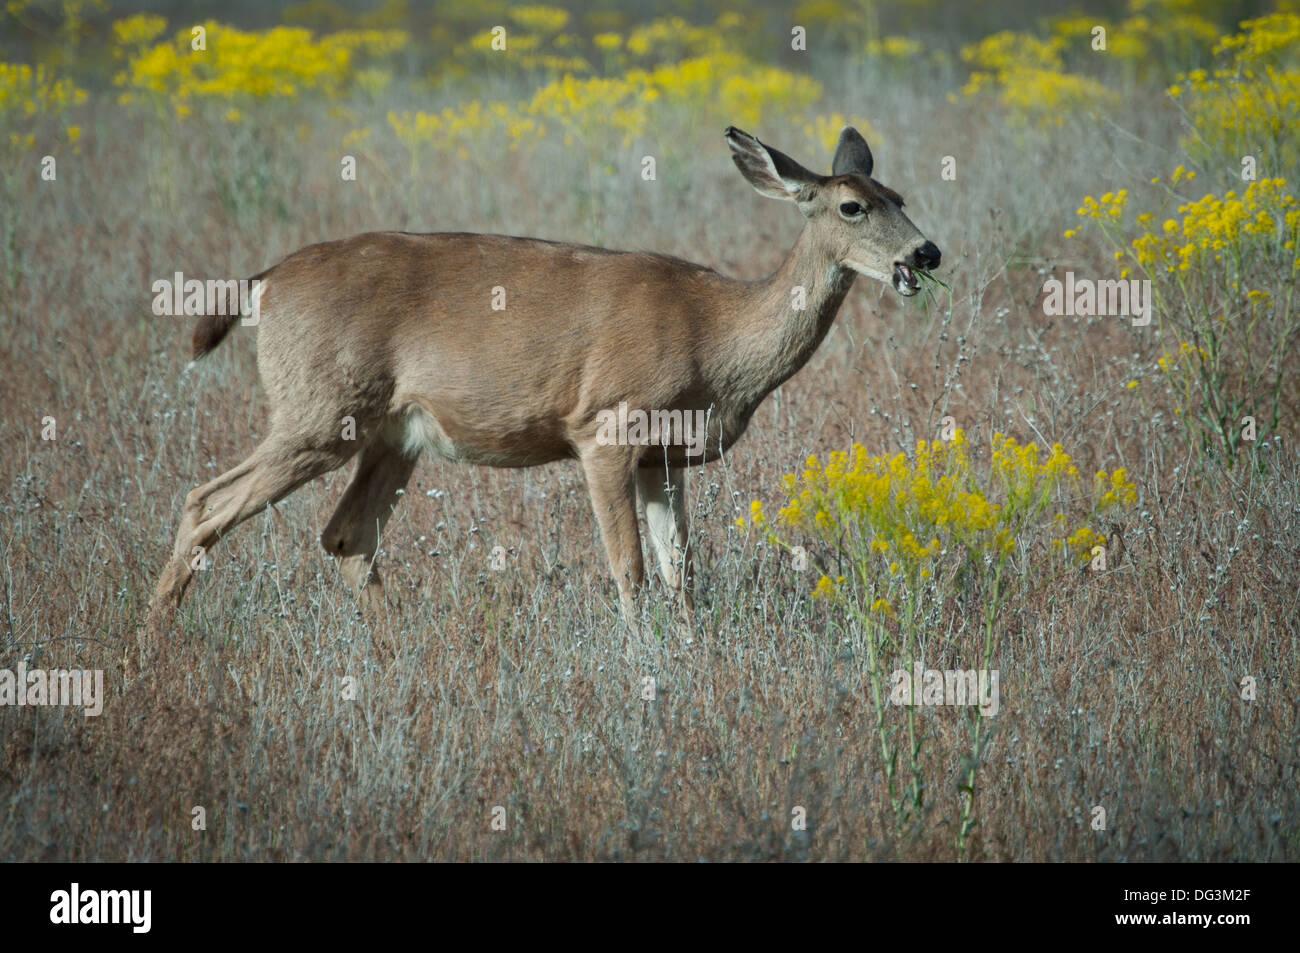 A Blacktail doe deer feeds in a field near Yreka,California. - Stock Image